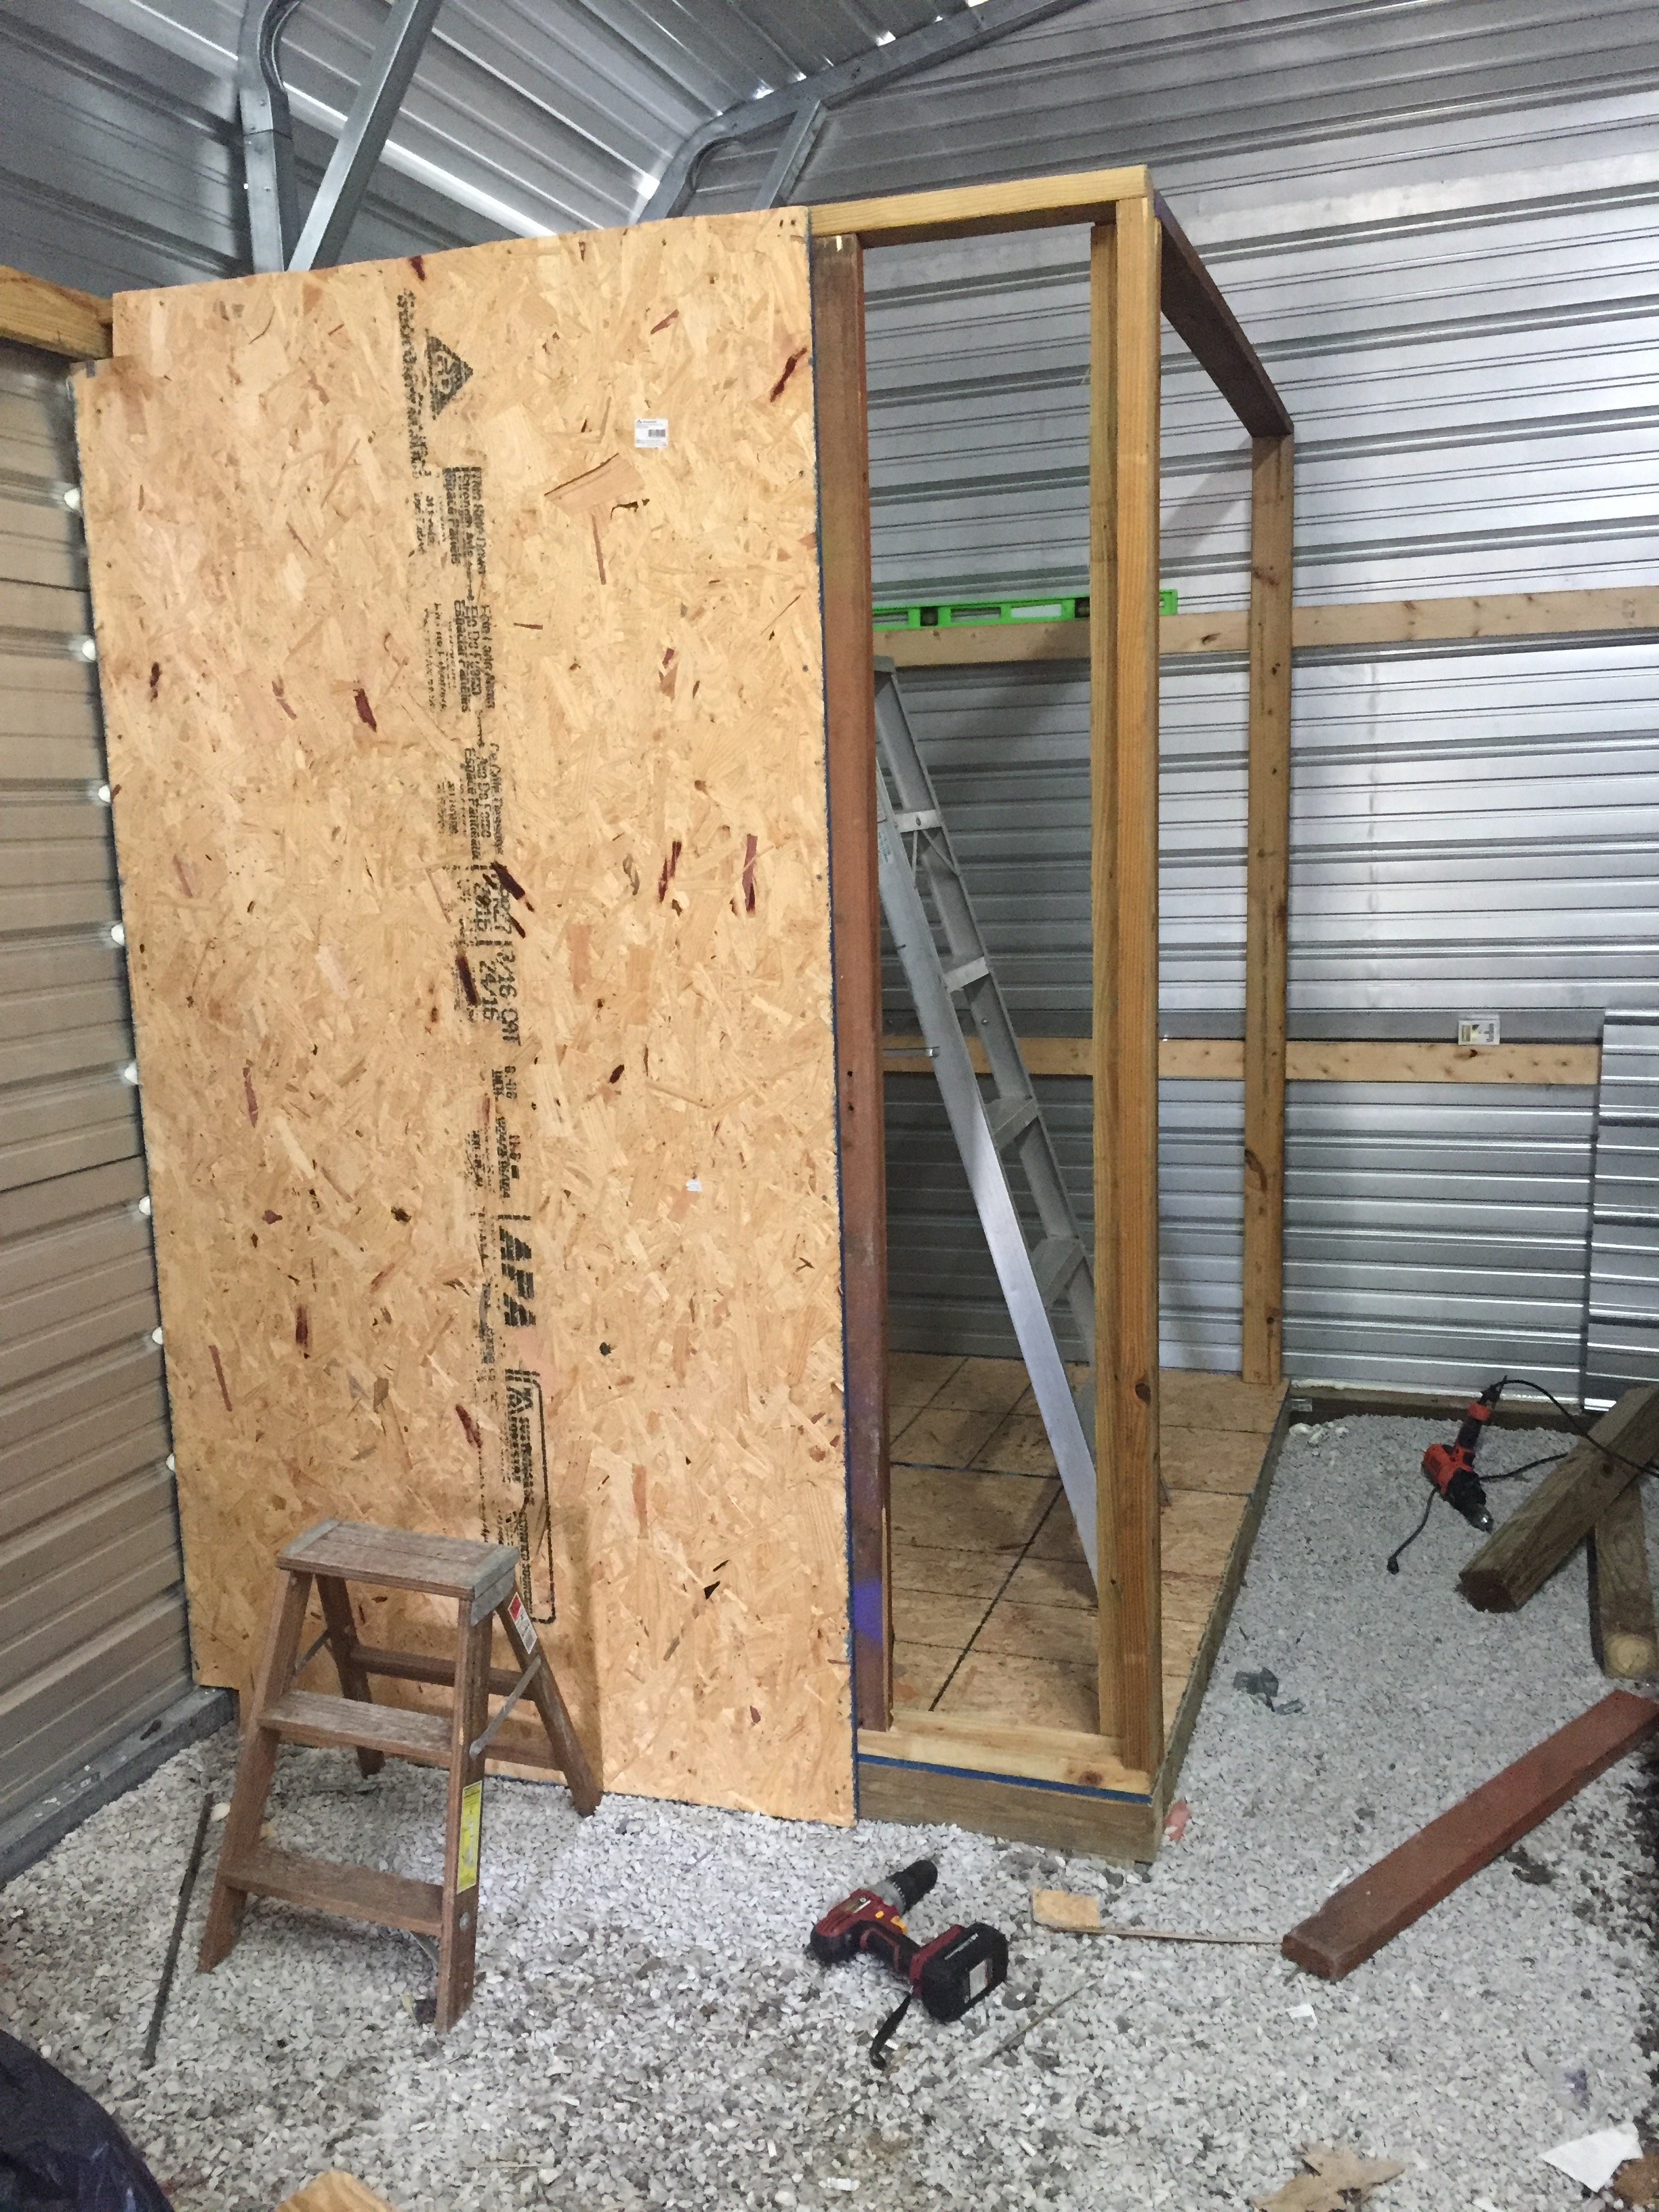 to basement how a geneslove puhngk krip secure me best room crypticpunk building gun grow tik build